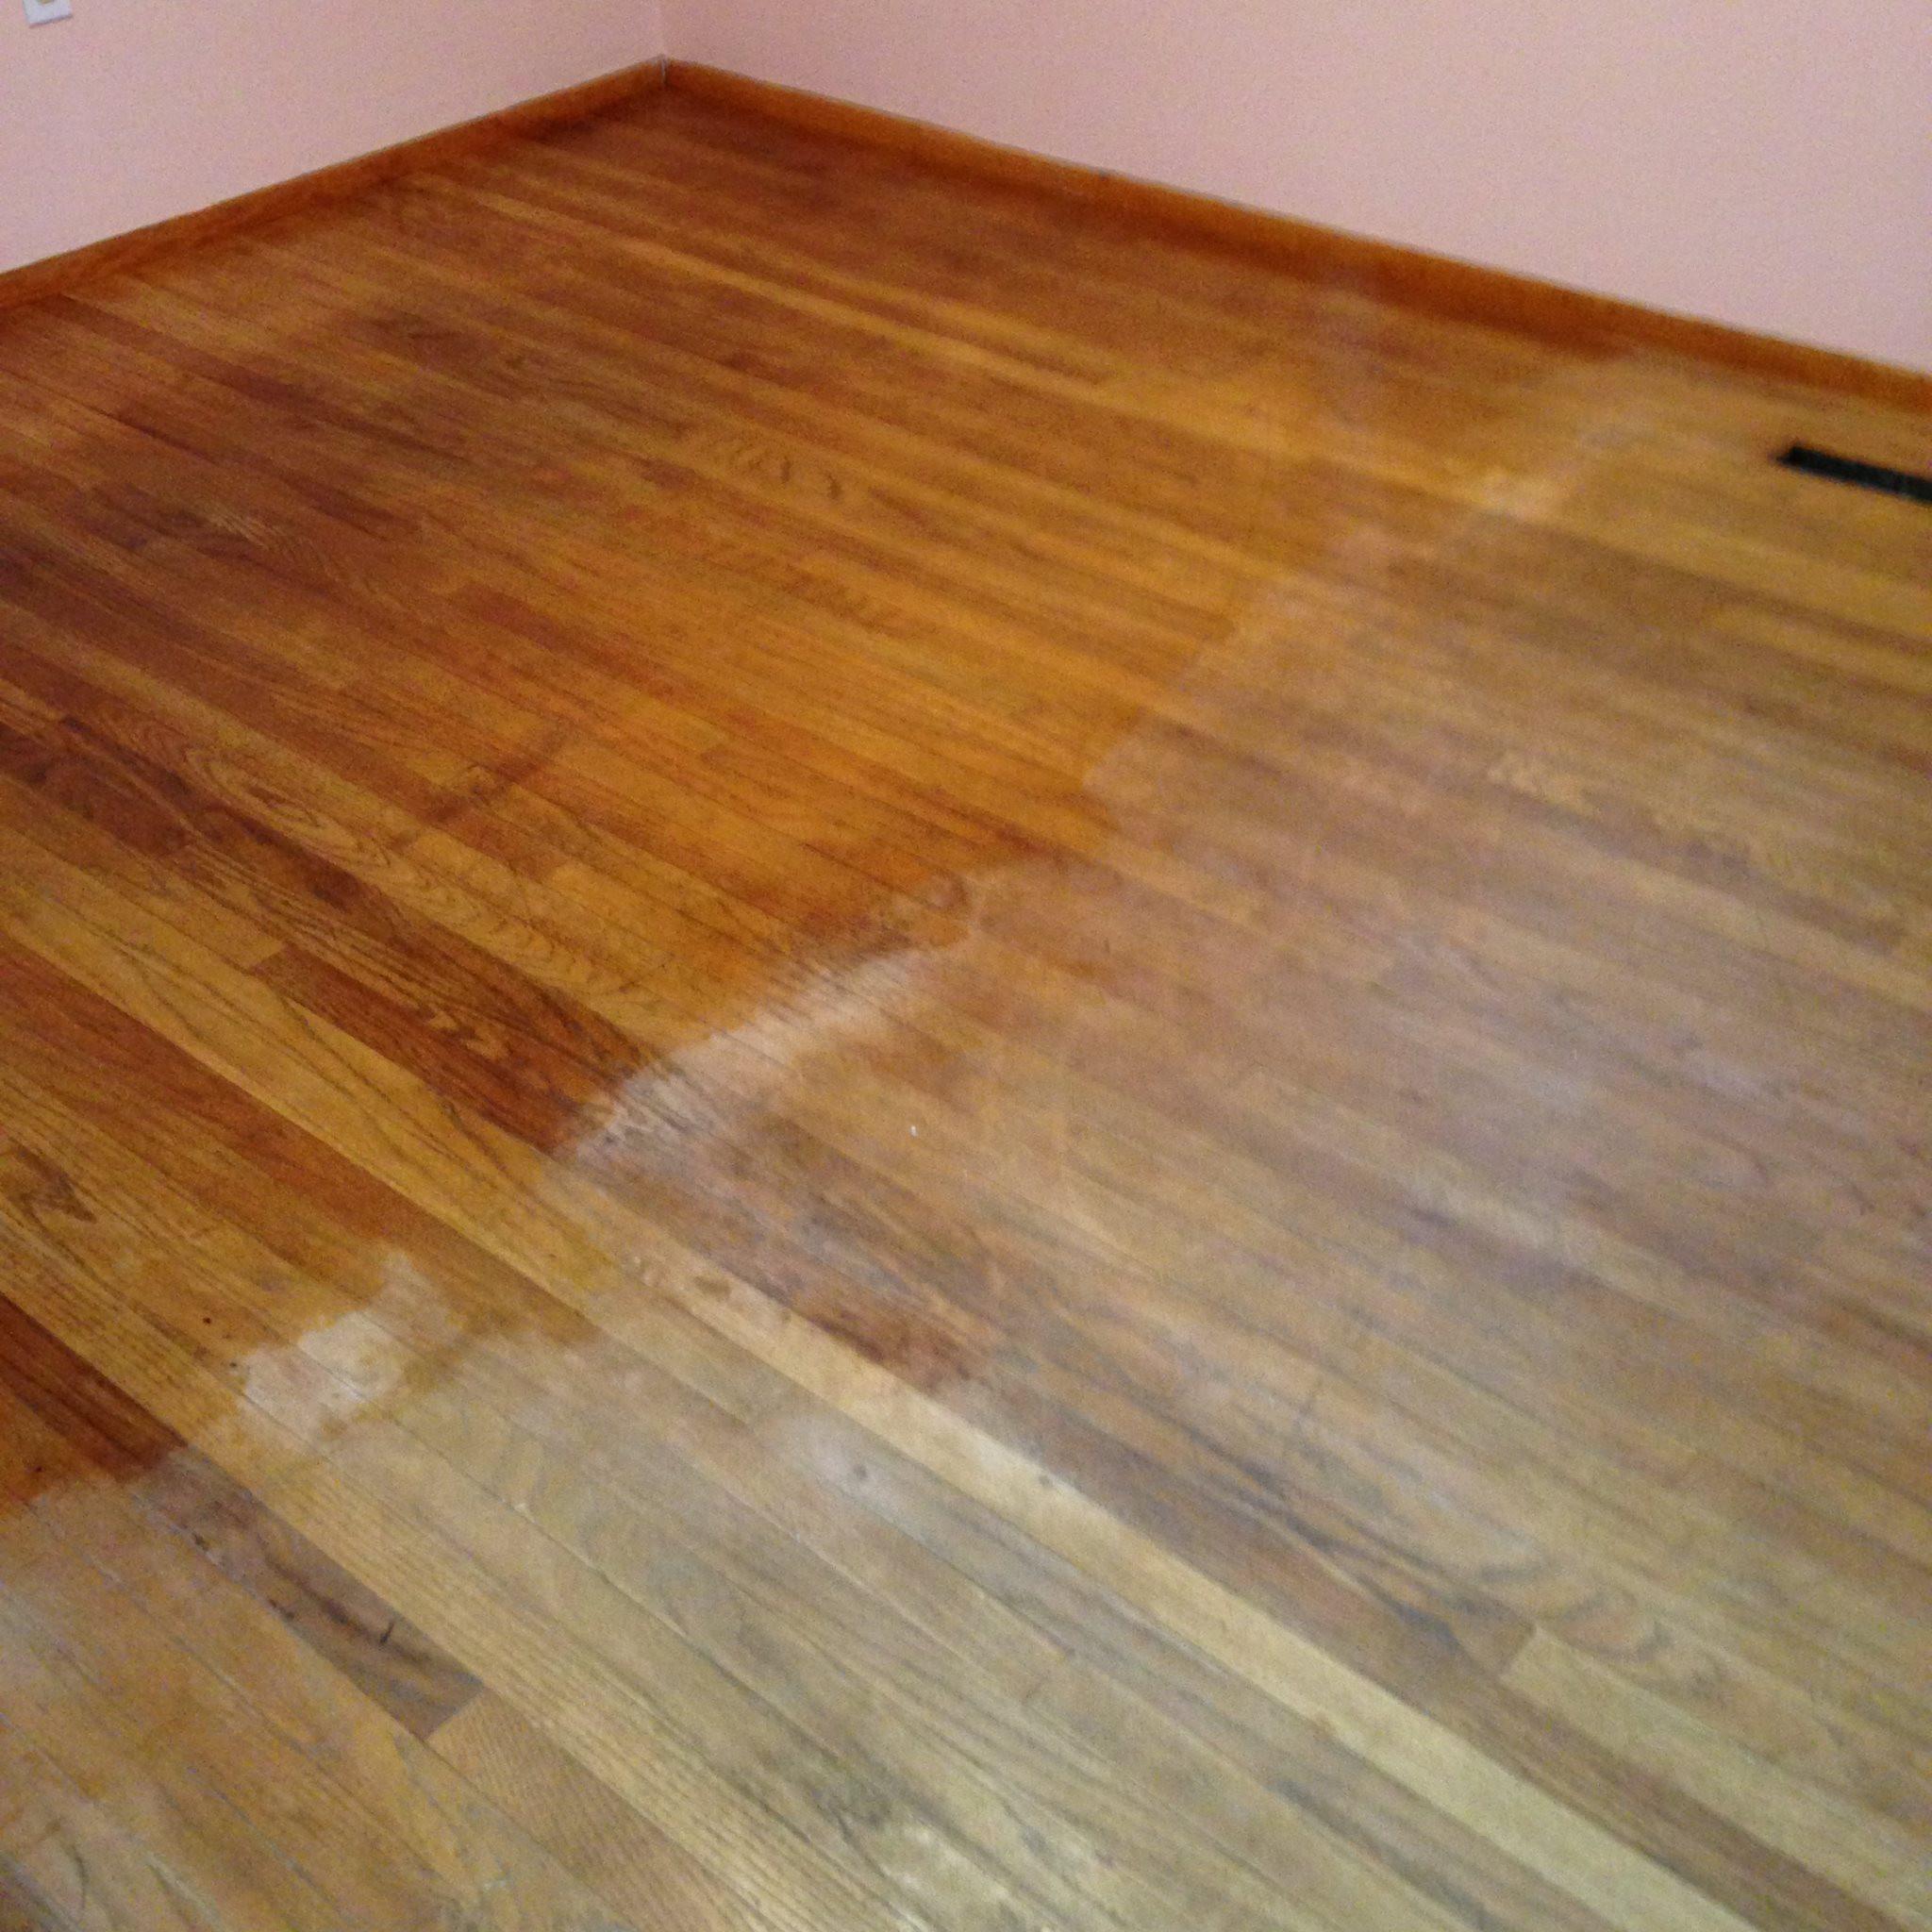 17 Nice Hardwood Floor Cleaning With